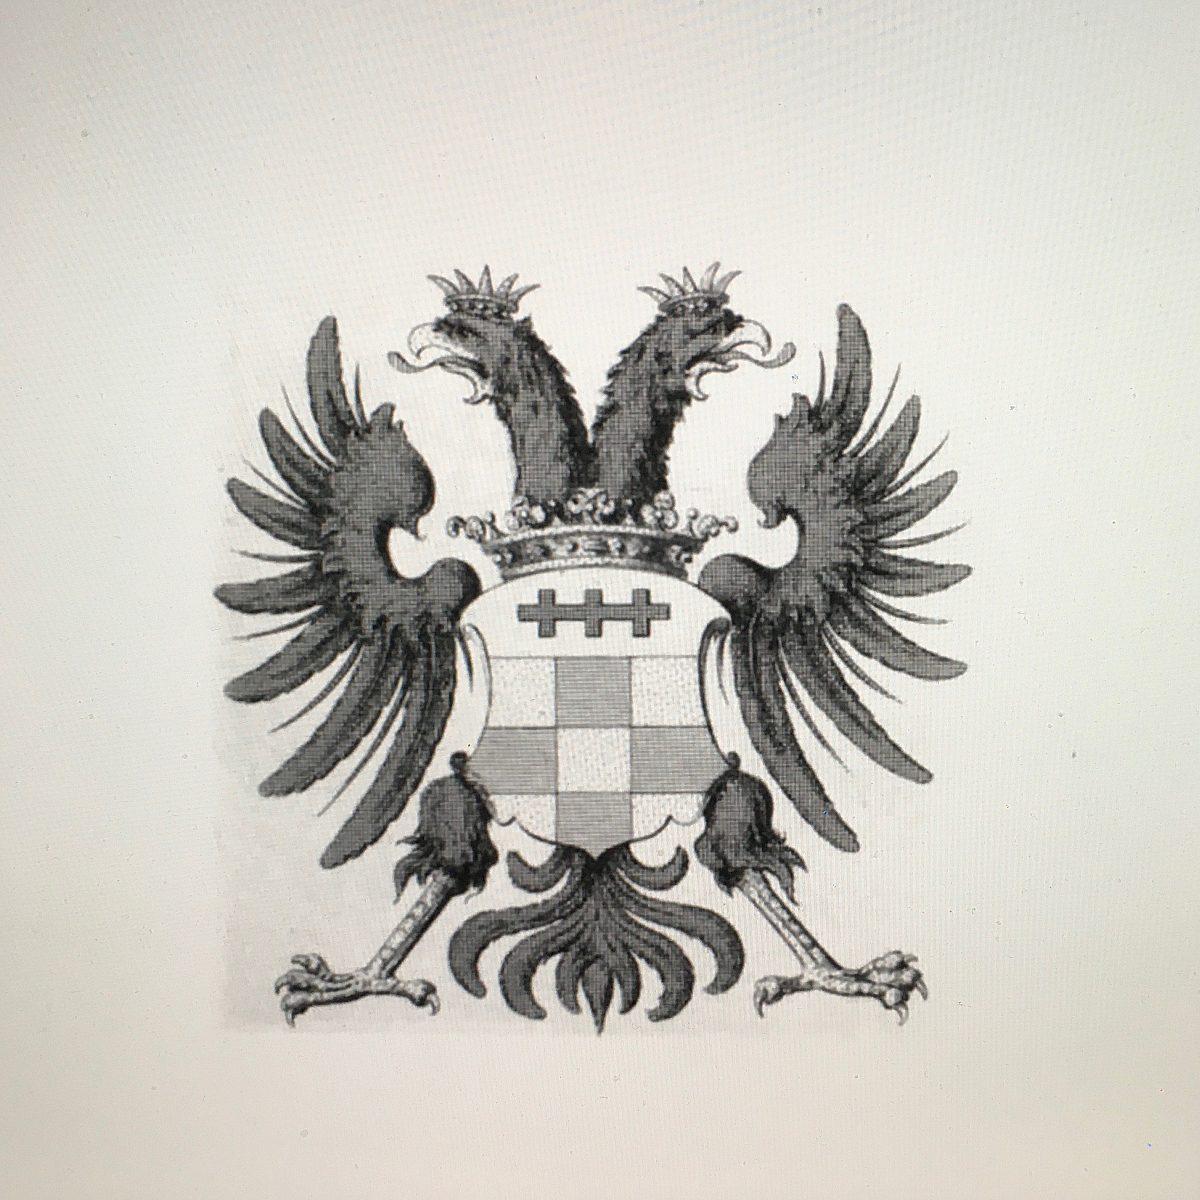 Das Wappen der Markgrafen Pallavicini